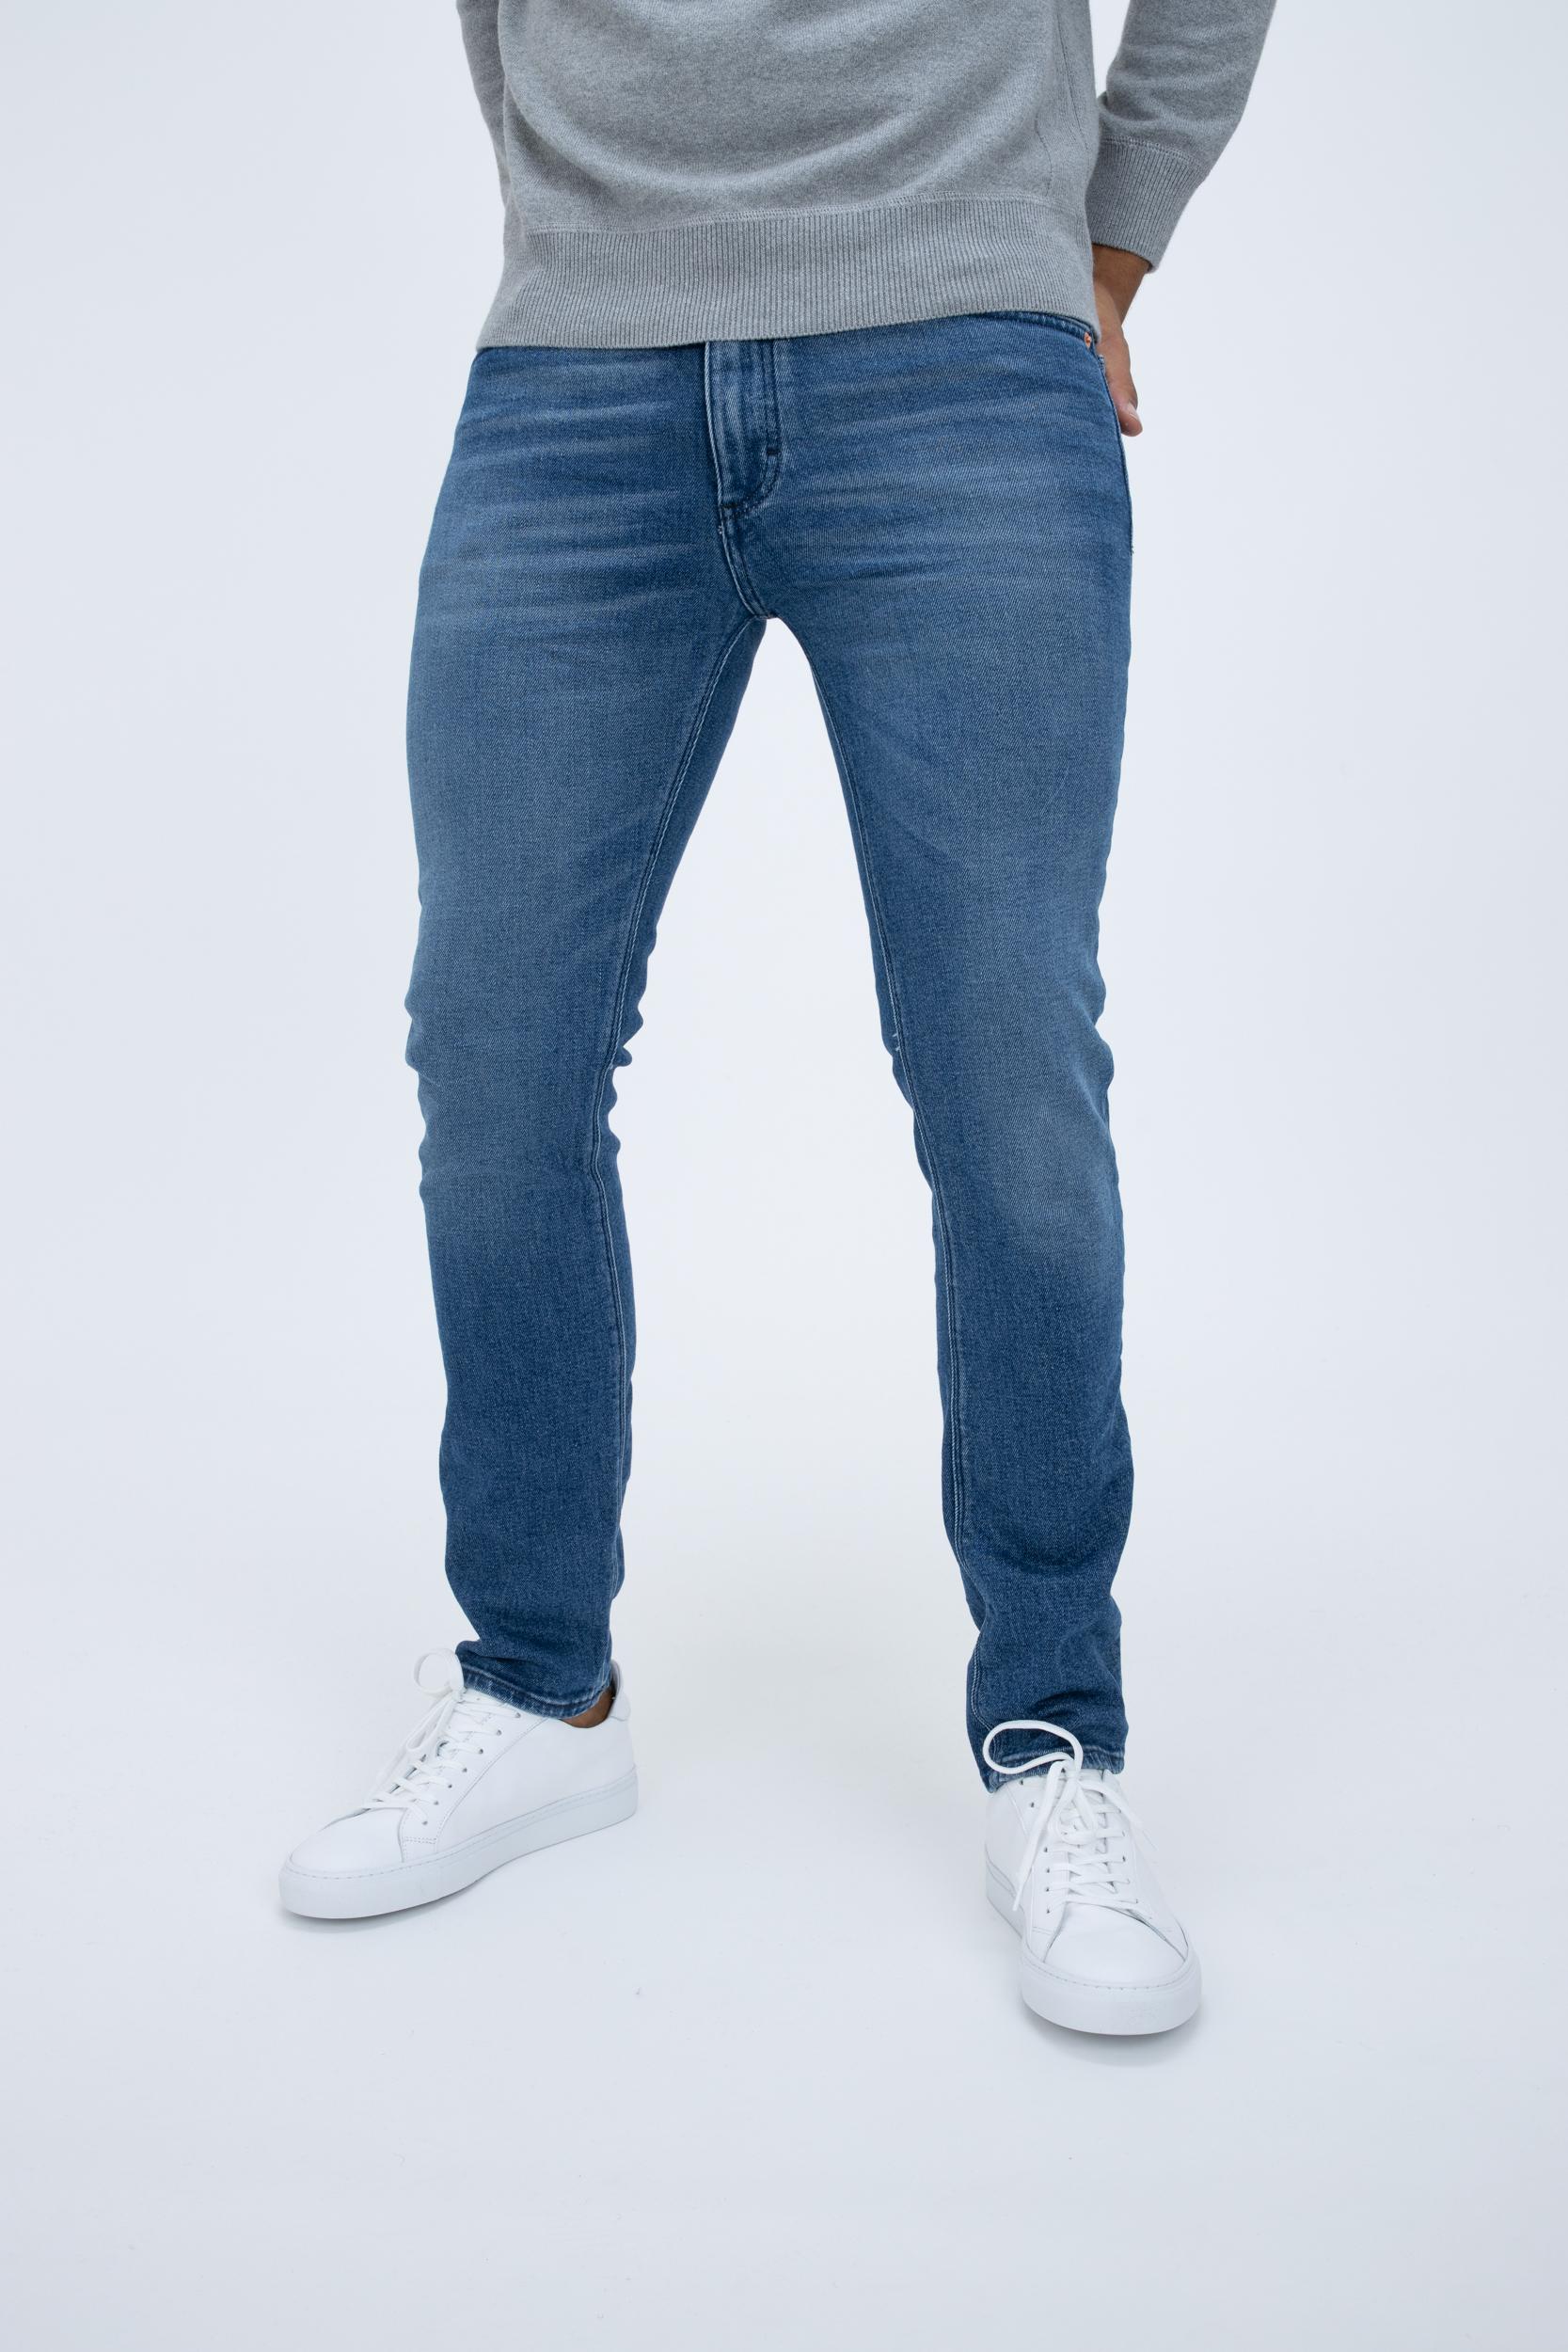 Jeans Slick